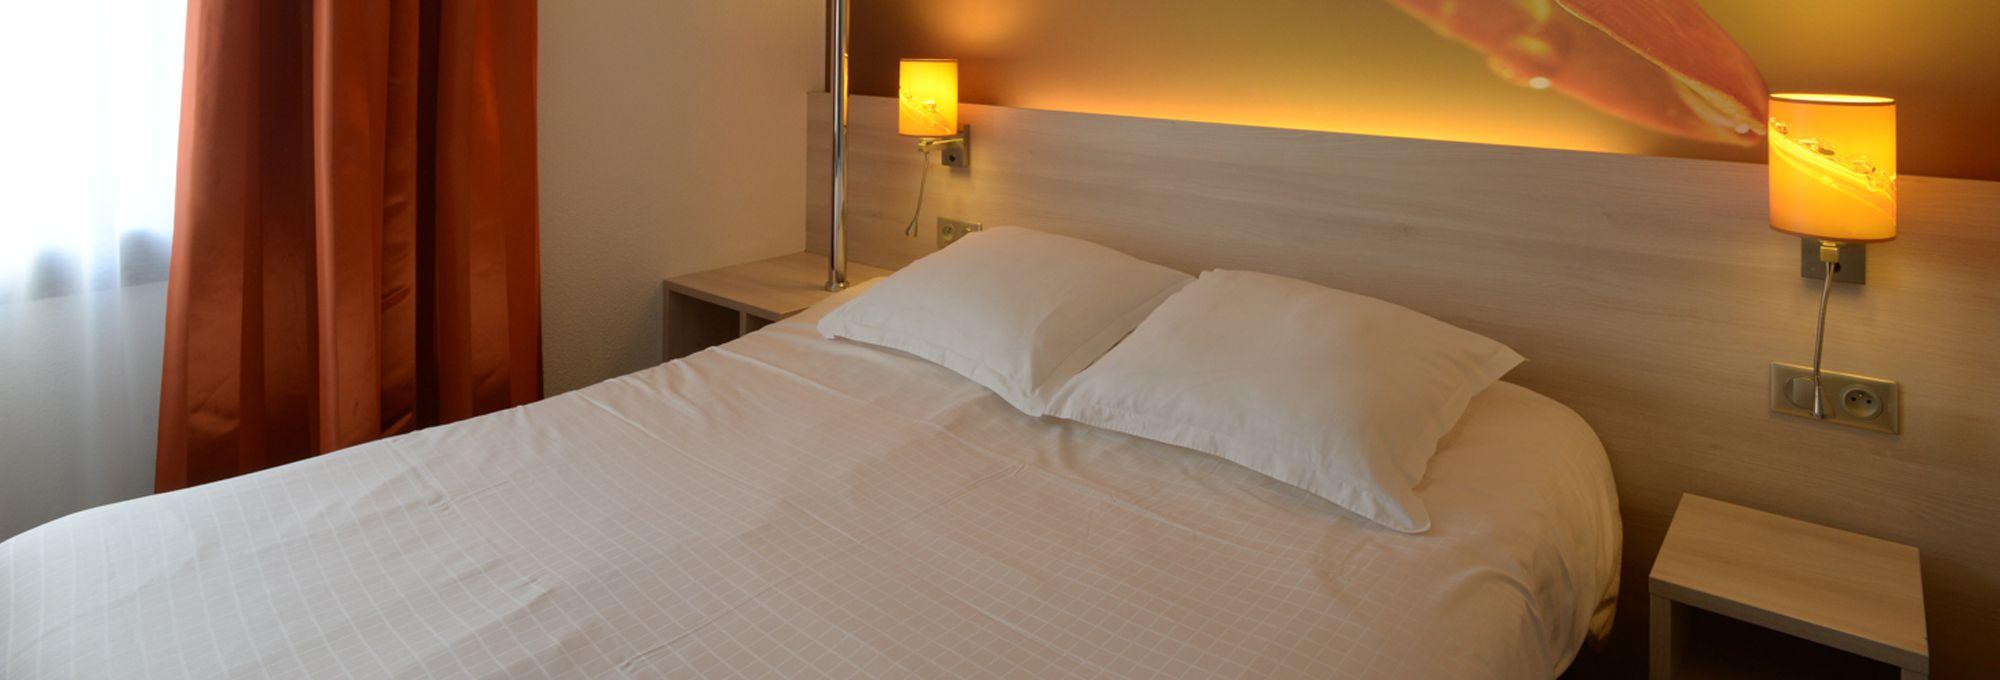 Brit Hotel Granville